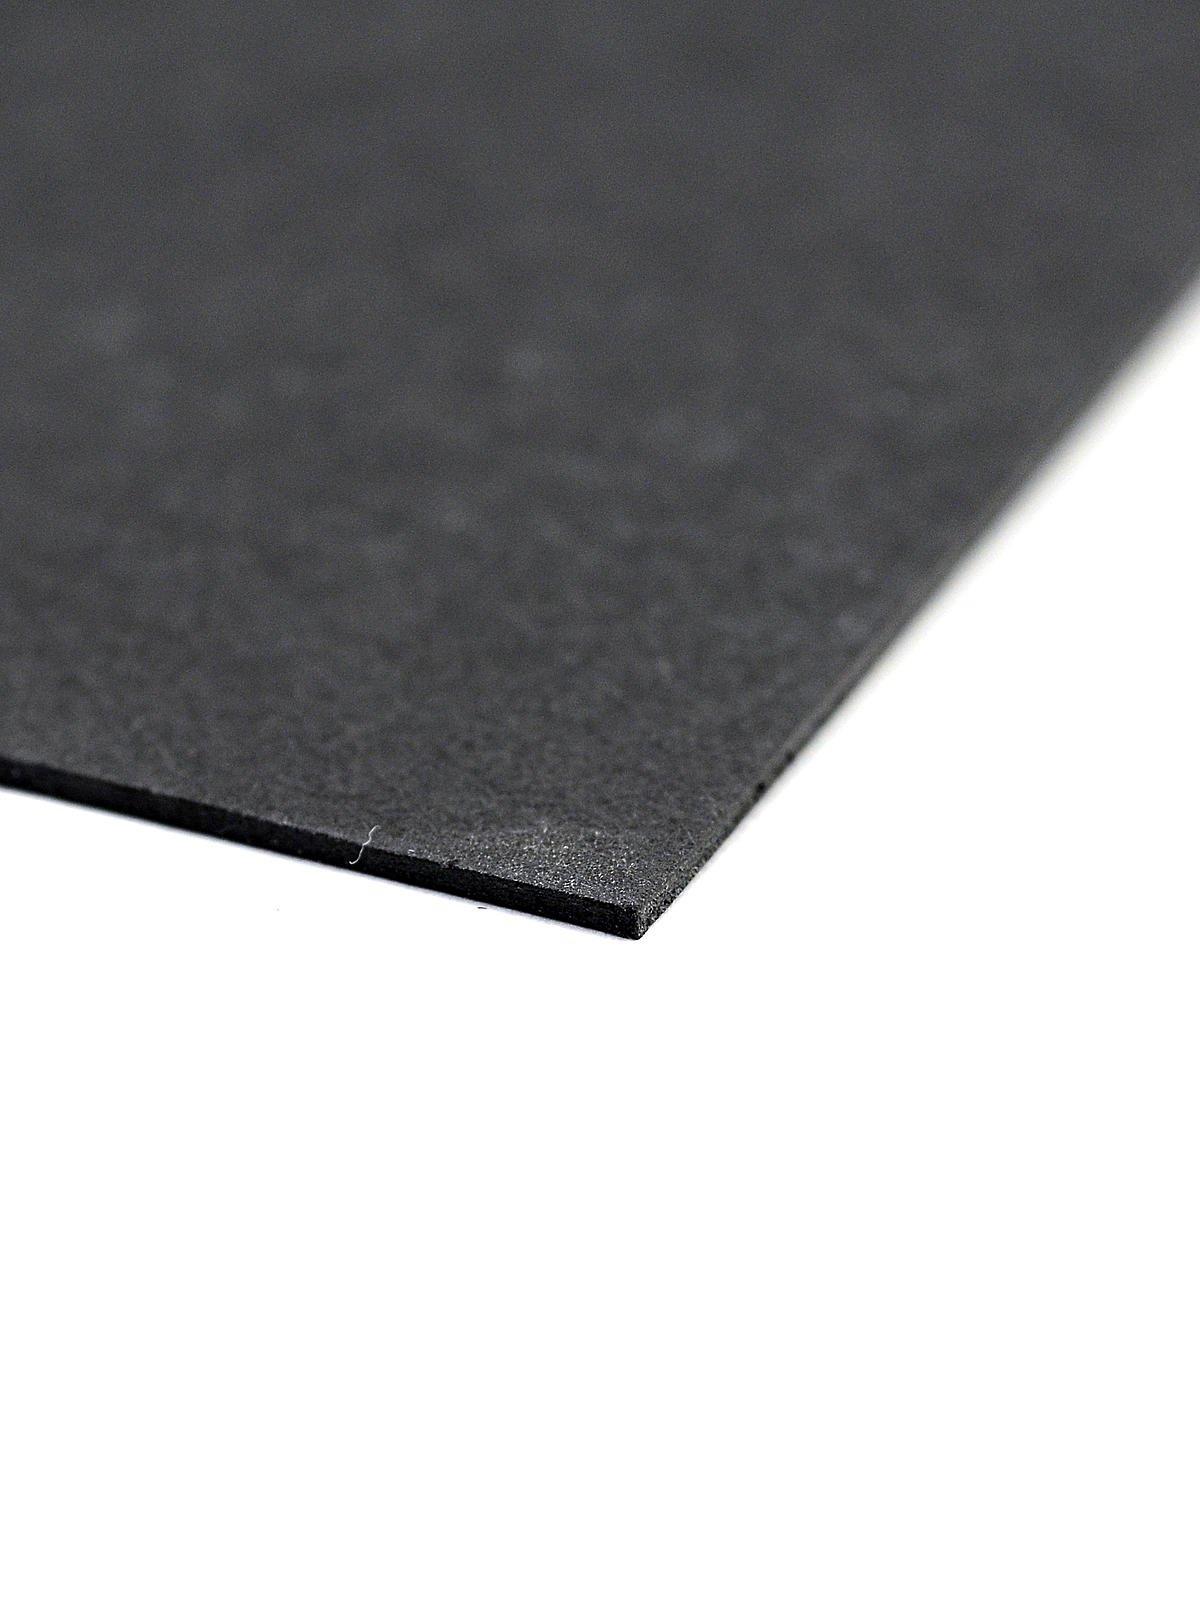 Bainbridge No. 100ST Super Black Mounting Board 15 in. x 20 in. each [PACK OF 10 ]